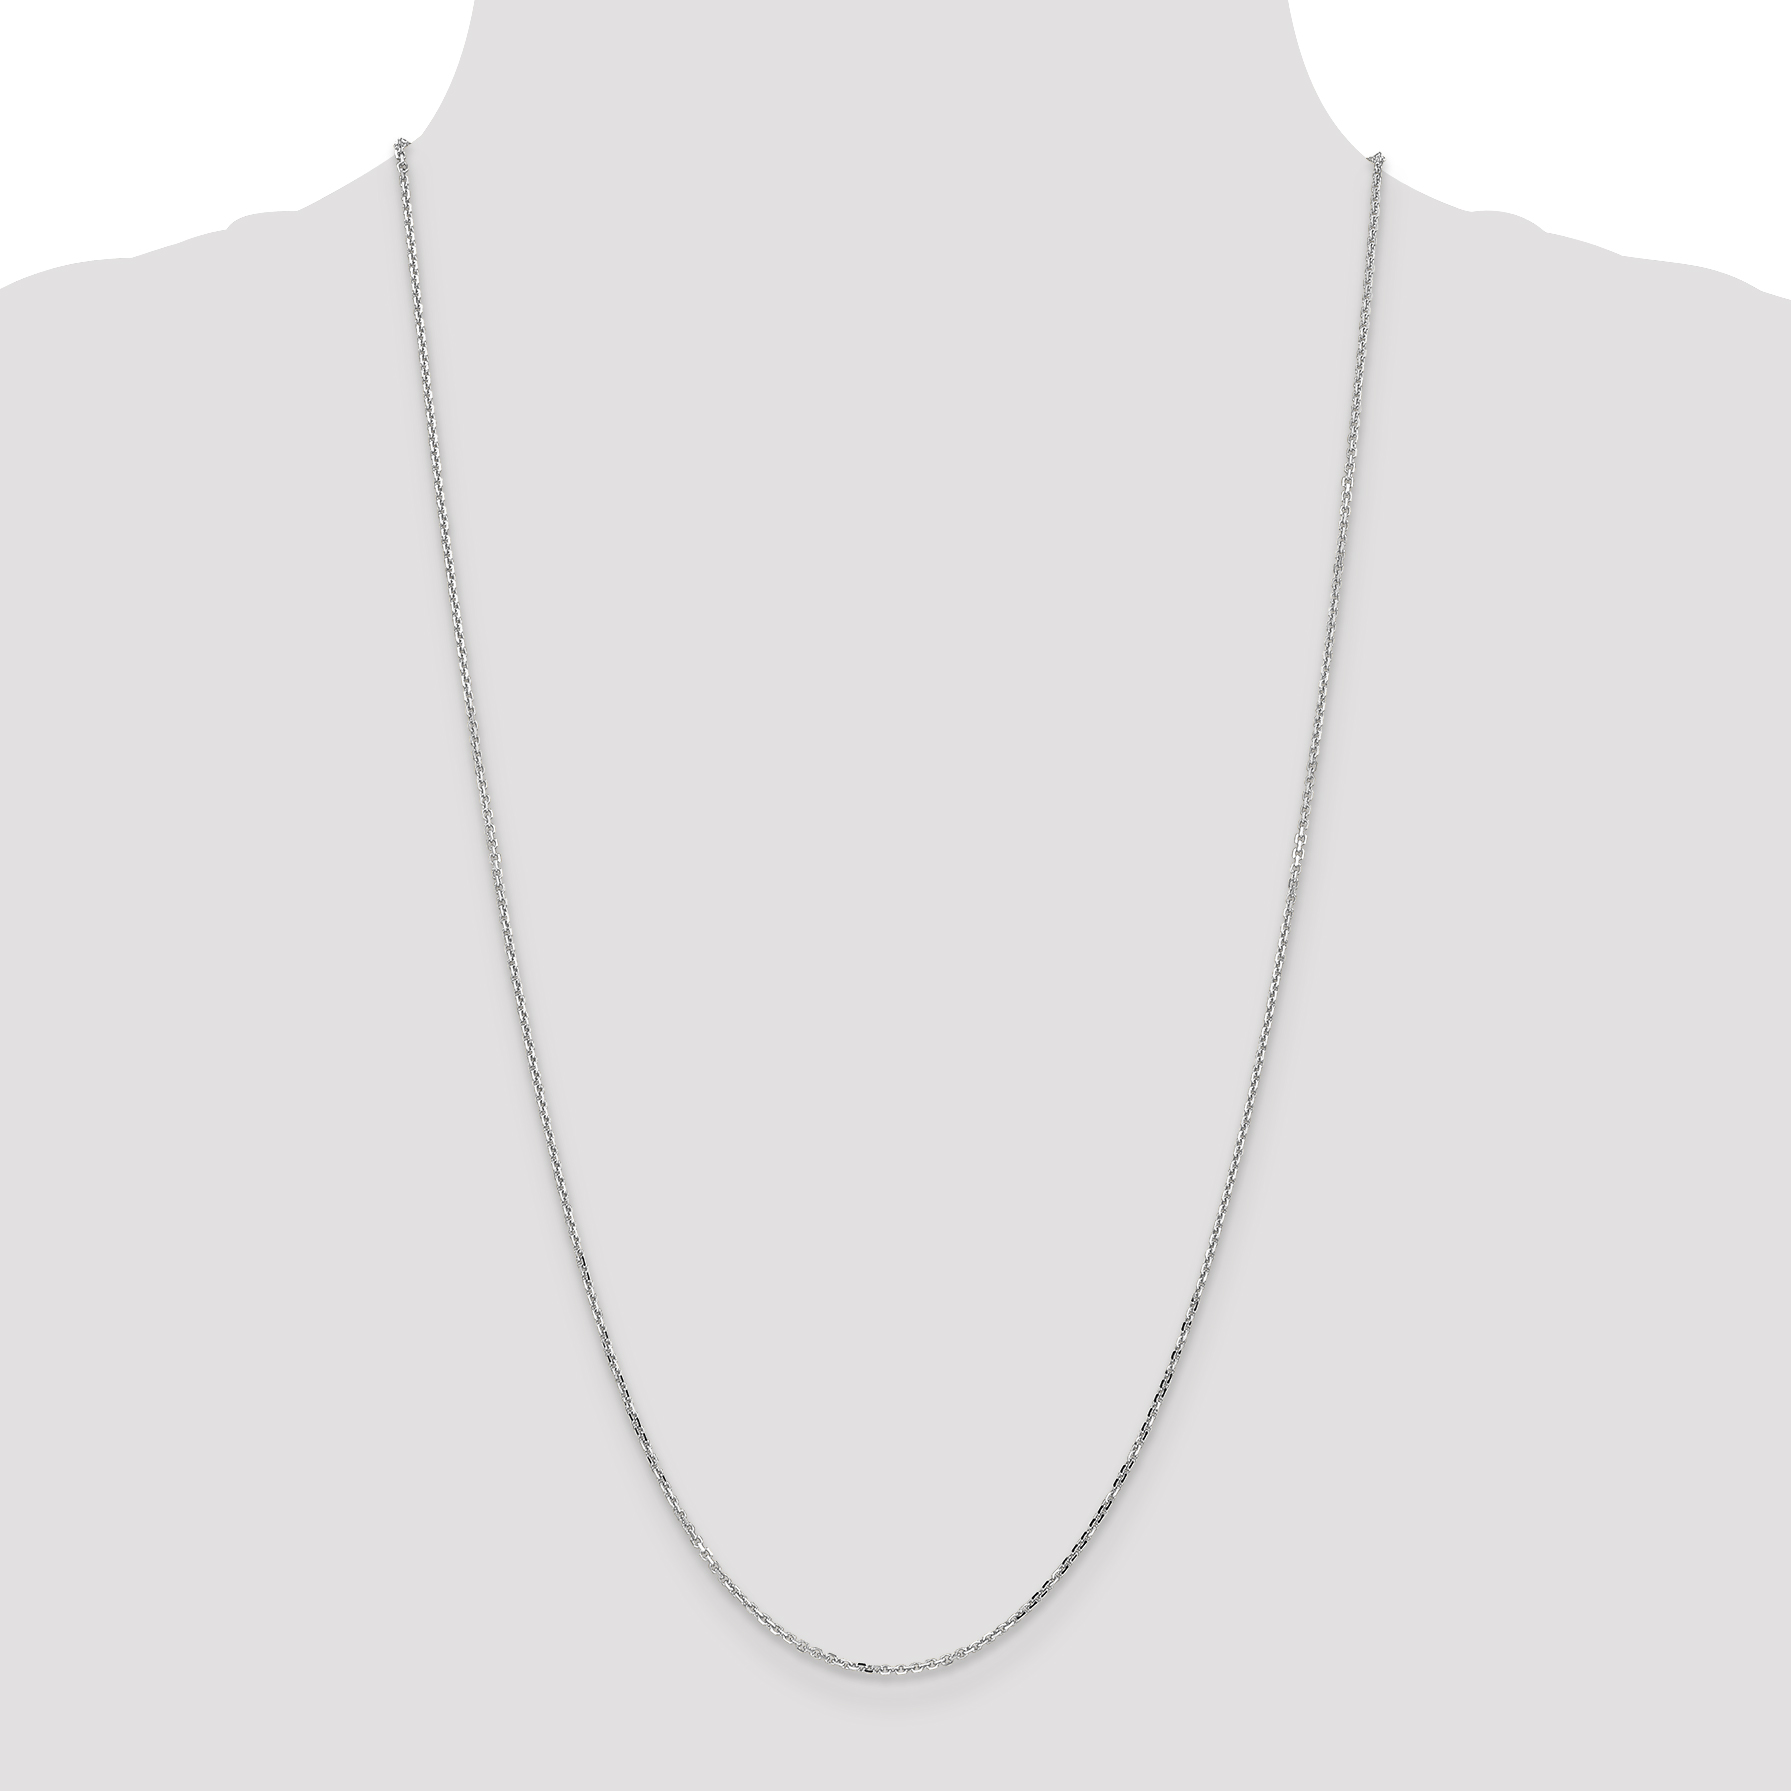 14K White Gold 1.40mm Diamond Cut Cable Chain 16 Inch - image 3 de 5